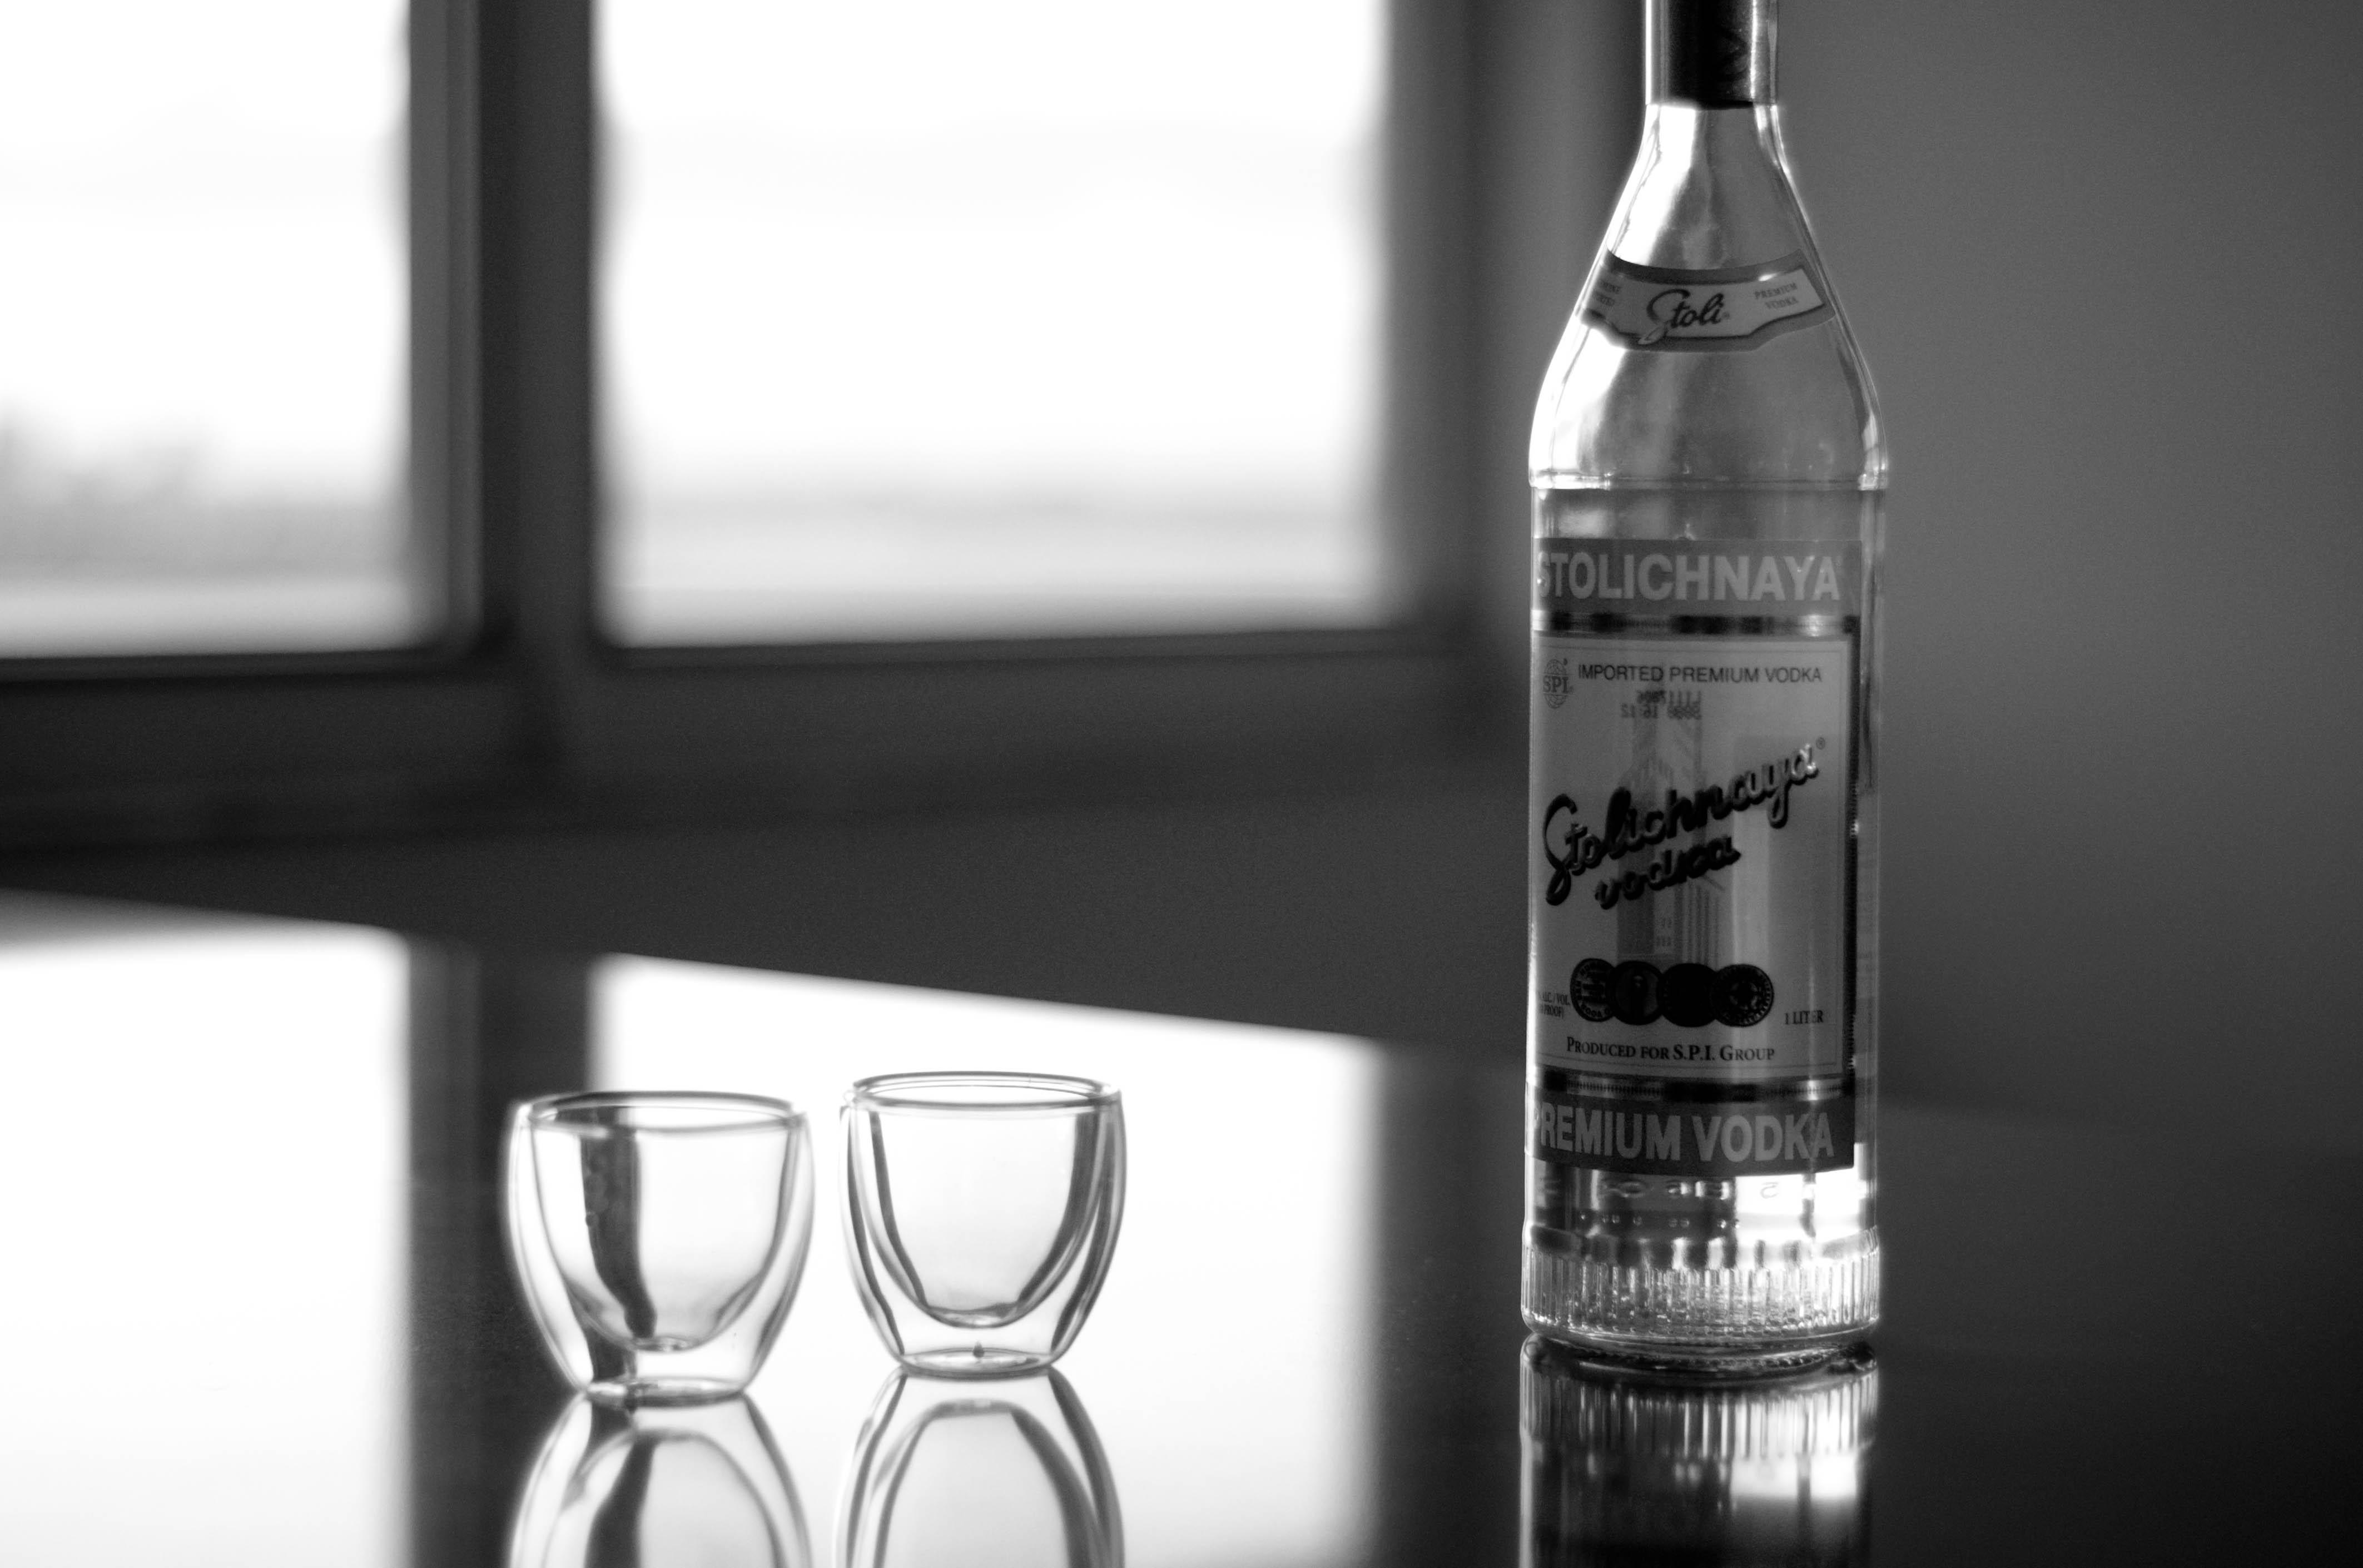 92+ Gambar Alkohol Anggur Terlihat Keren